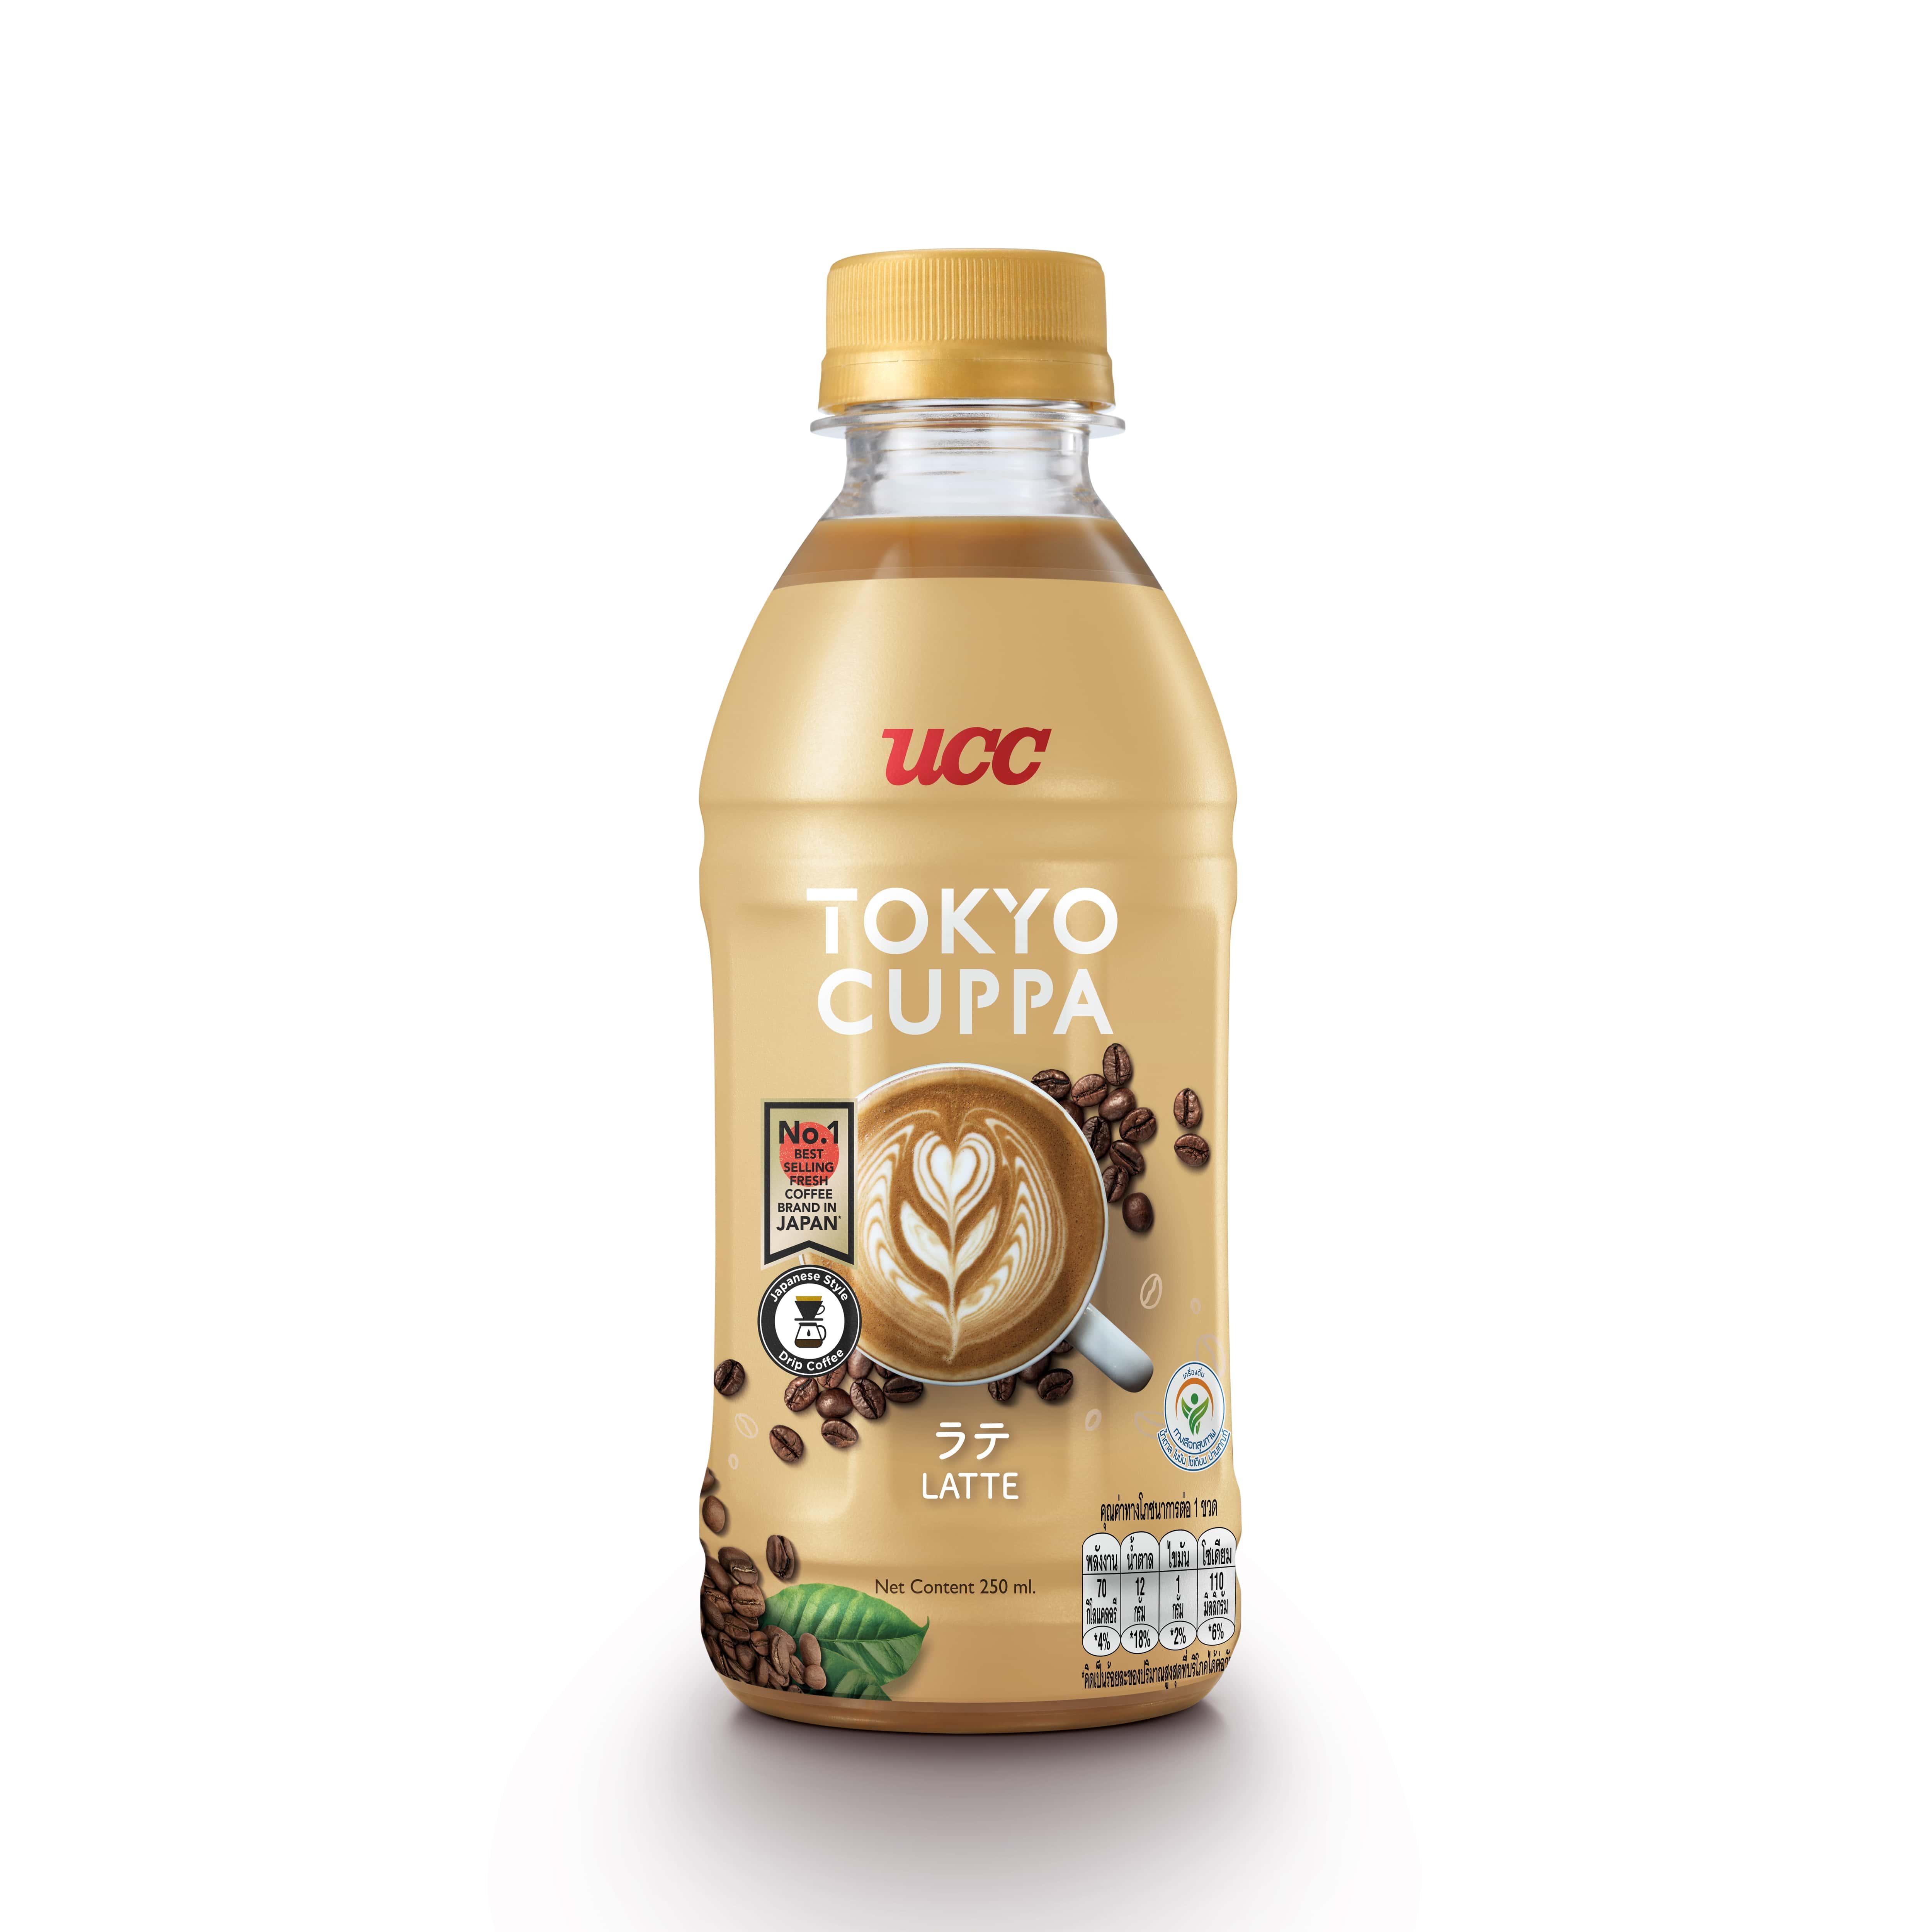 UCC Tokyo Cuppa Latte